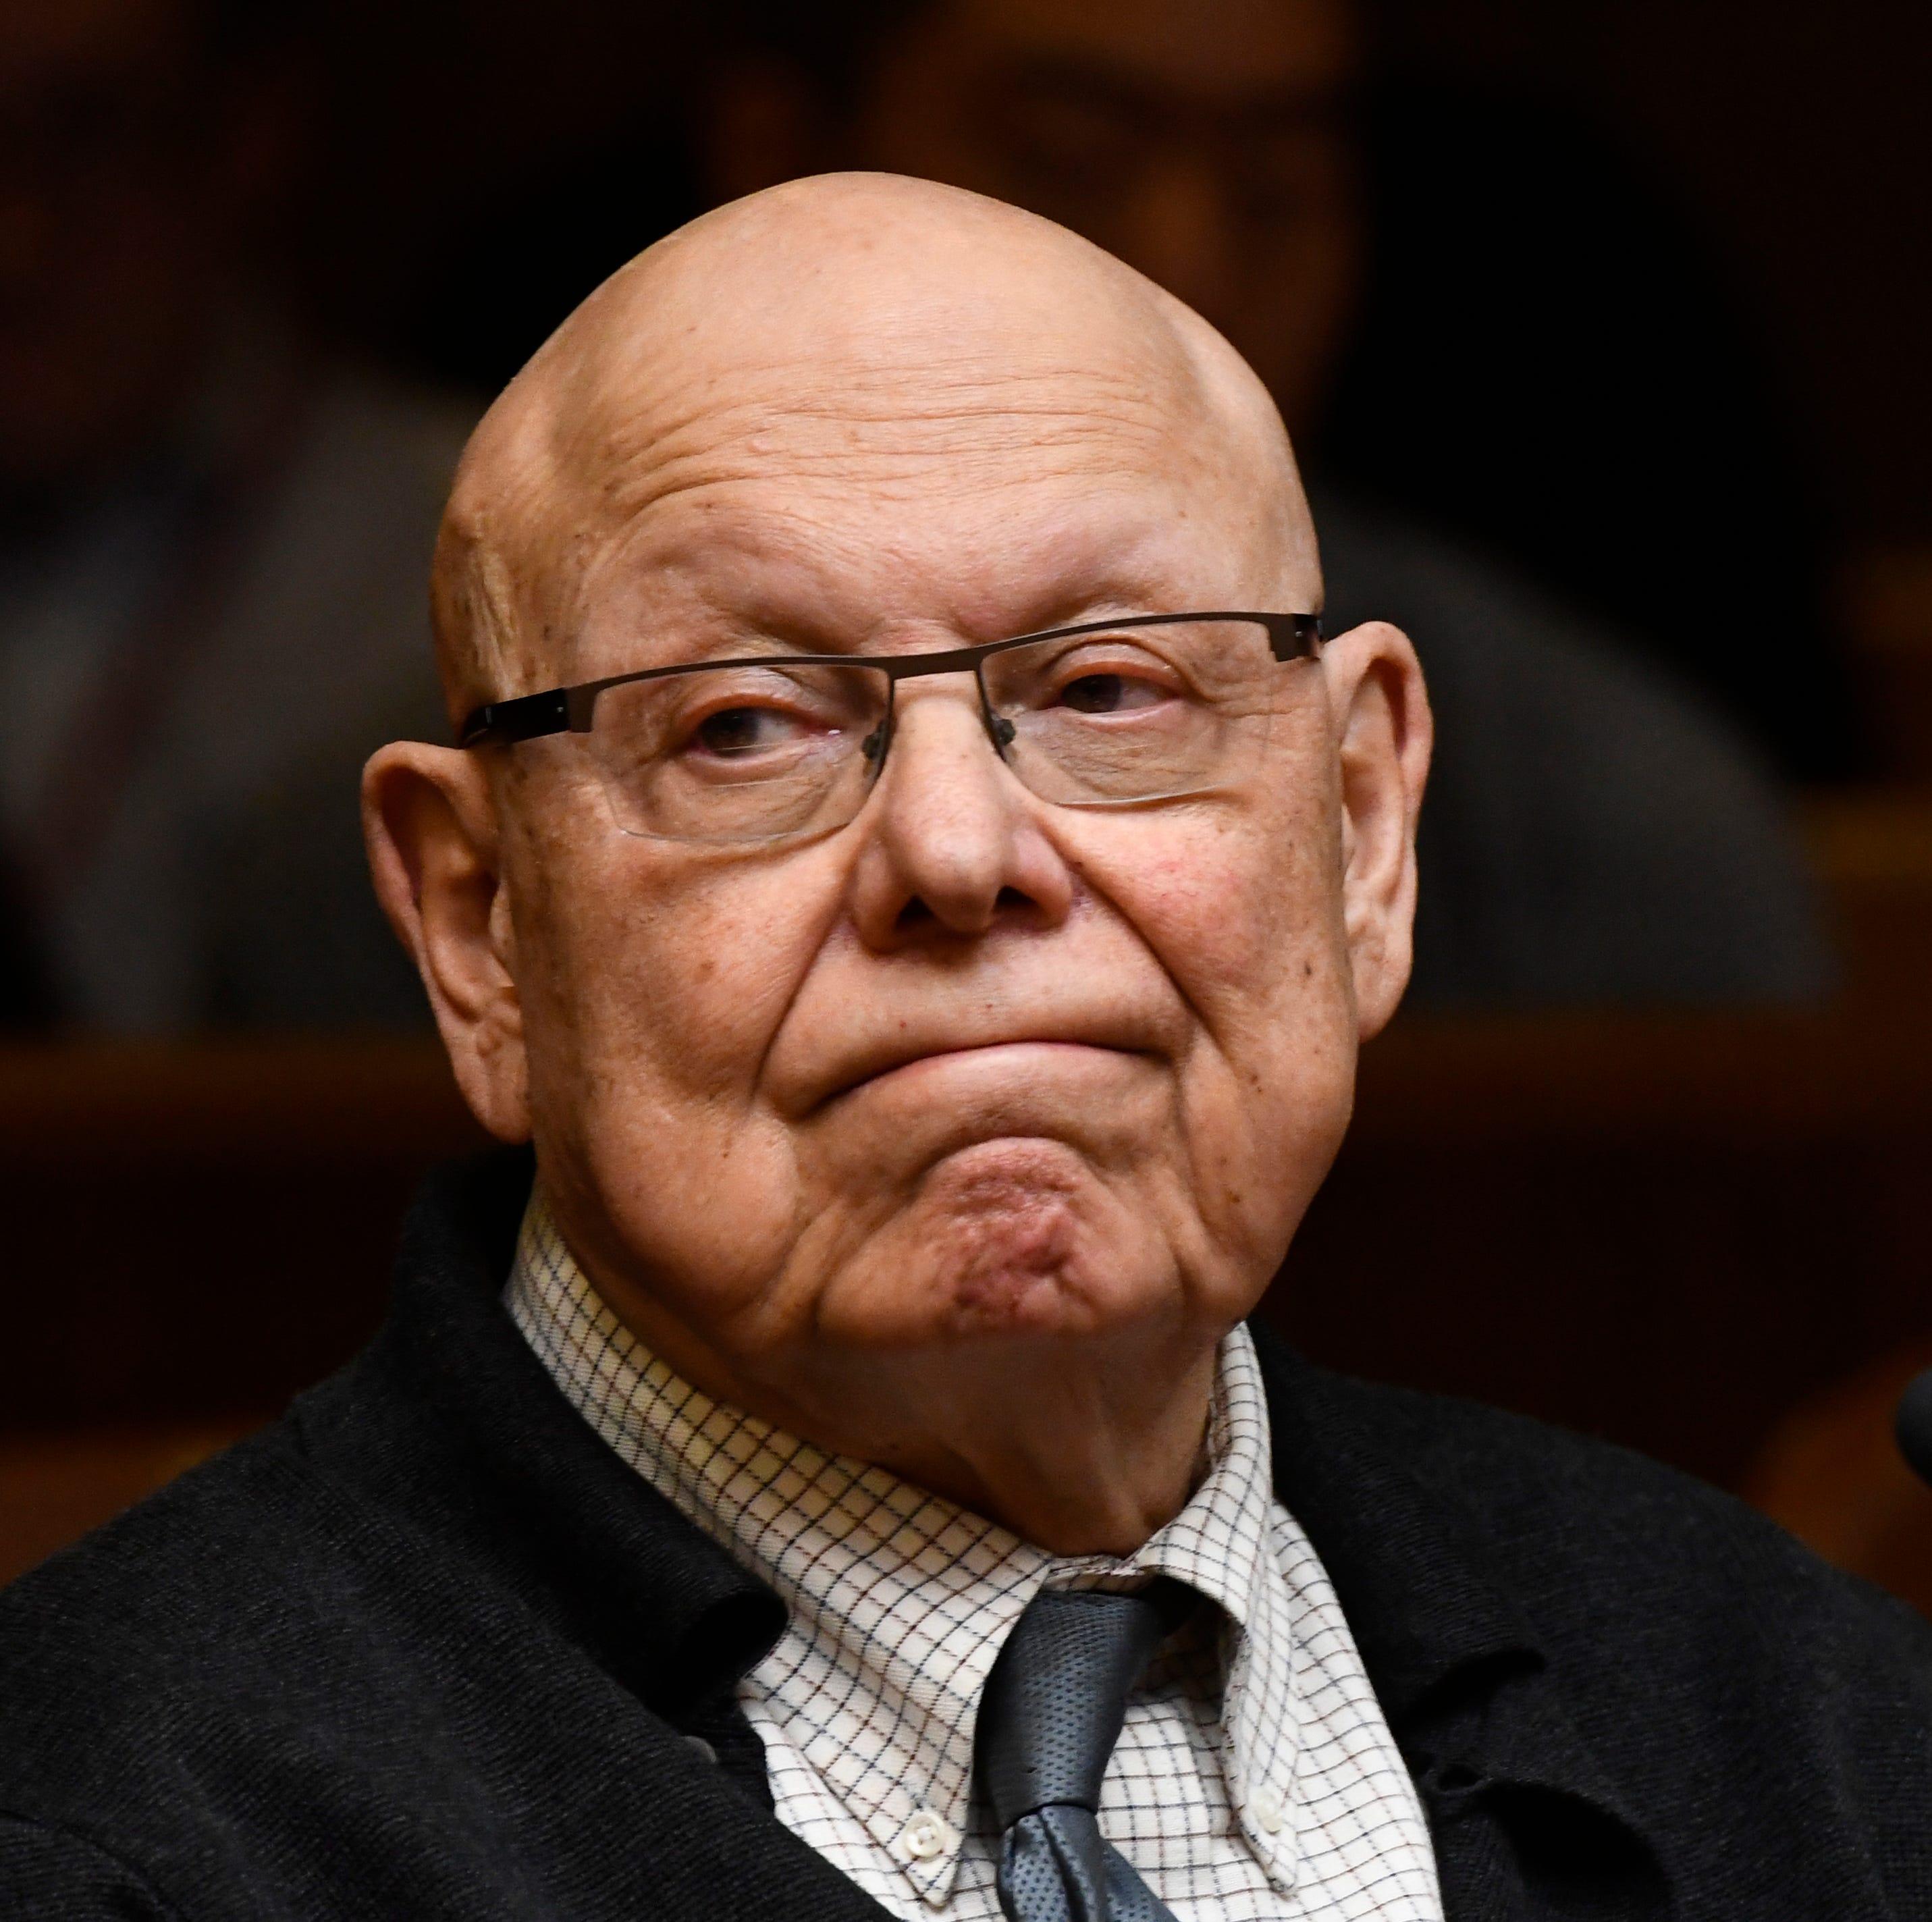 Psychologist in Nassar case surrenders license